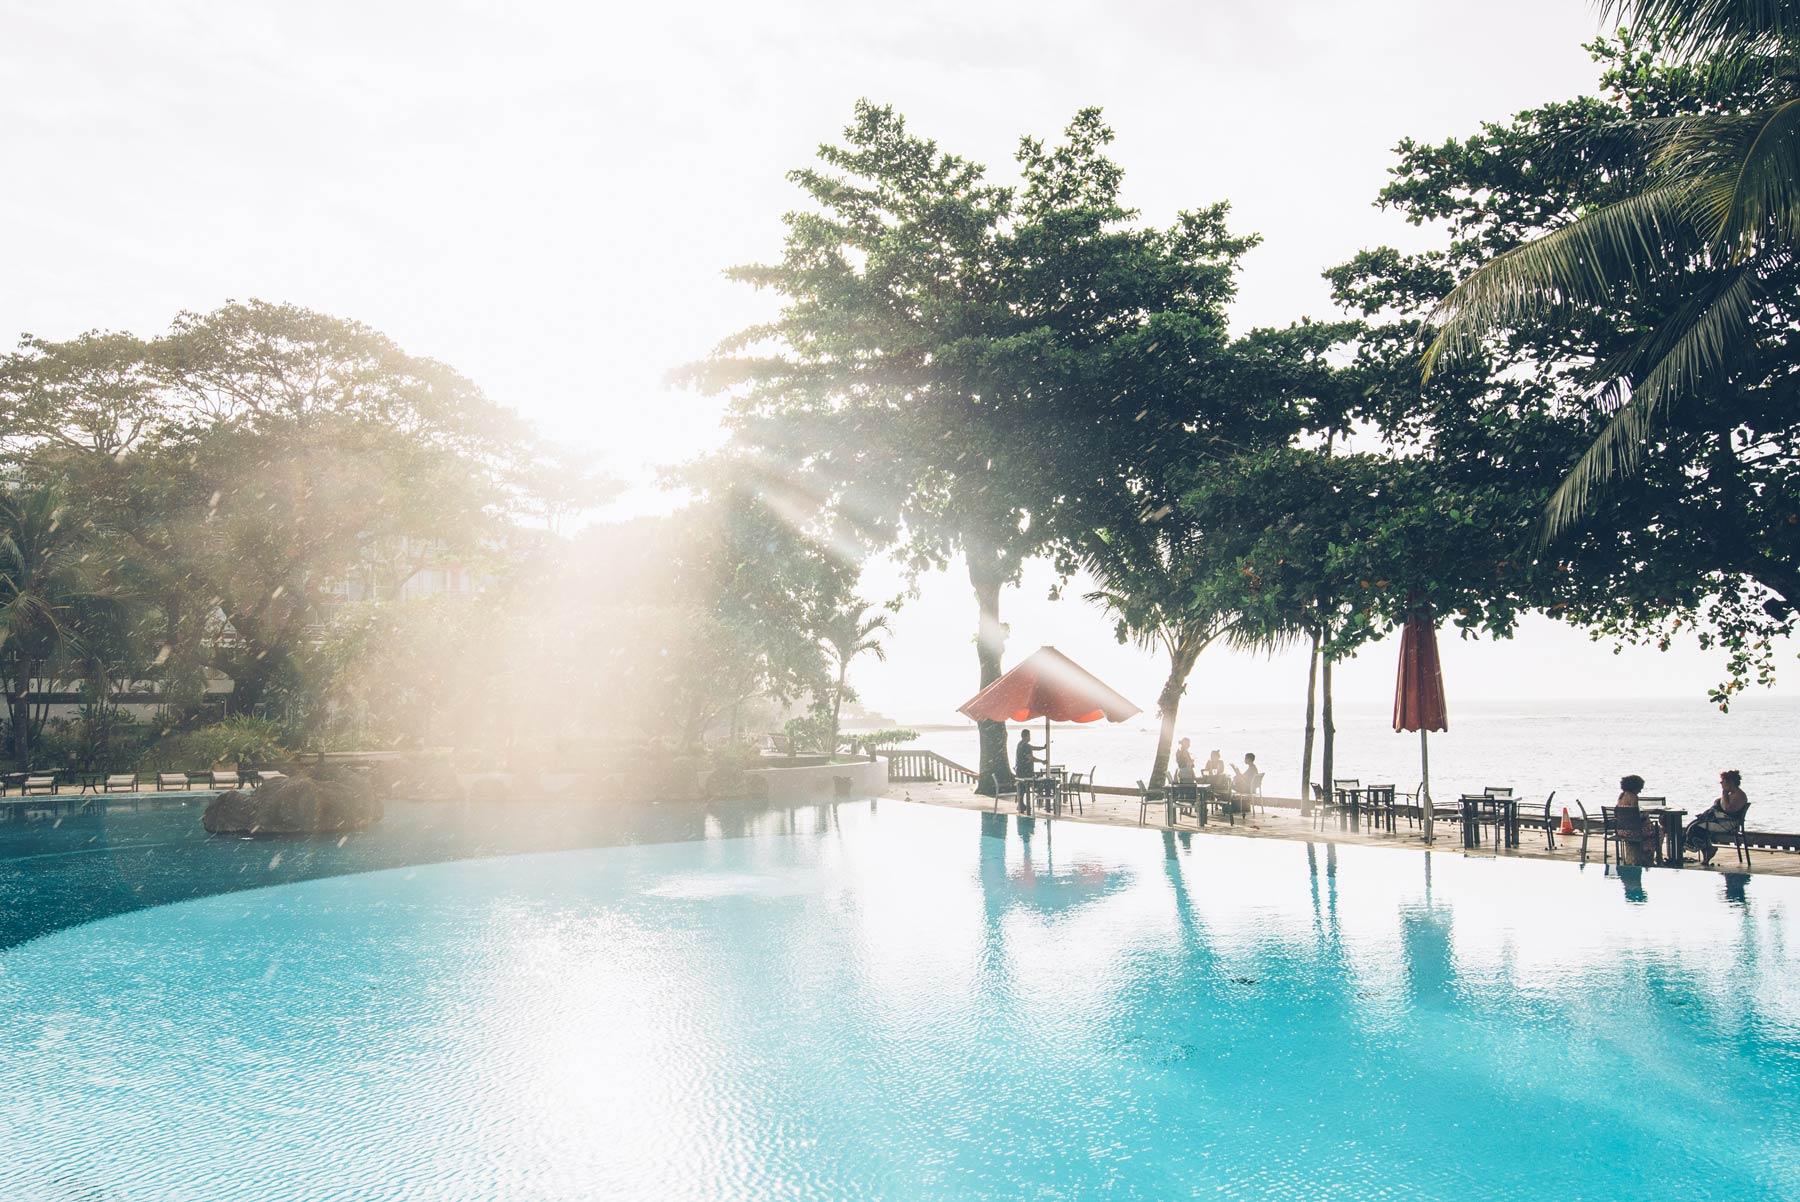 Pearl beach Resort, Tahiti, Polynésie Française